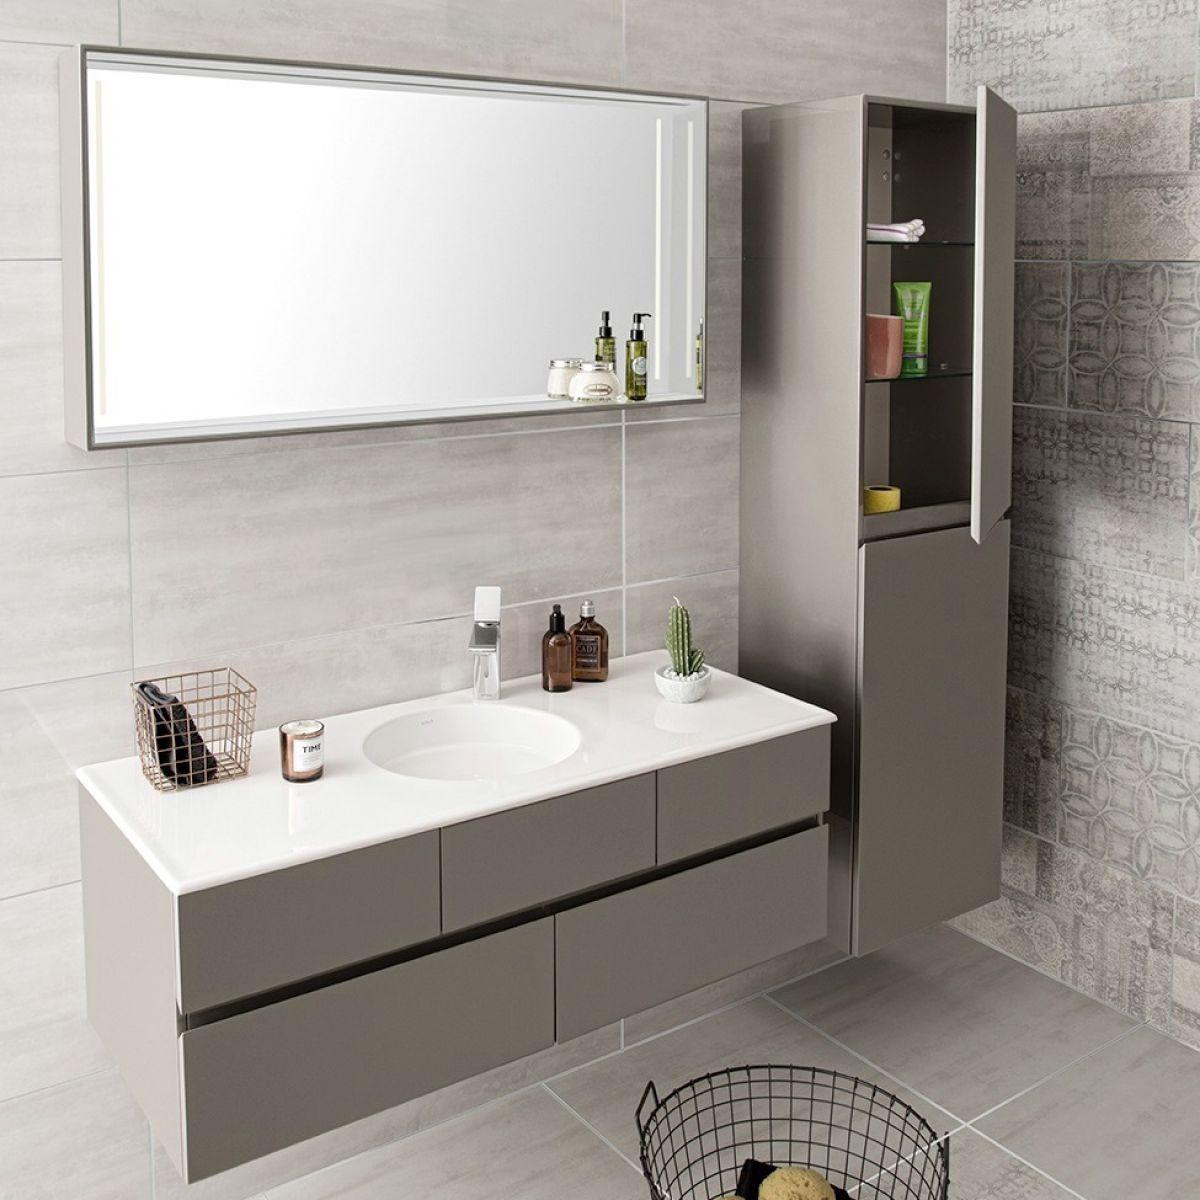 Vitra Memoria 1200mm Vanity With Circular Bowl Bathroom Interior Design Bathroom Interior Modern White Bathroom